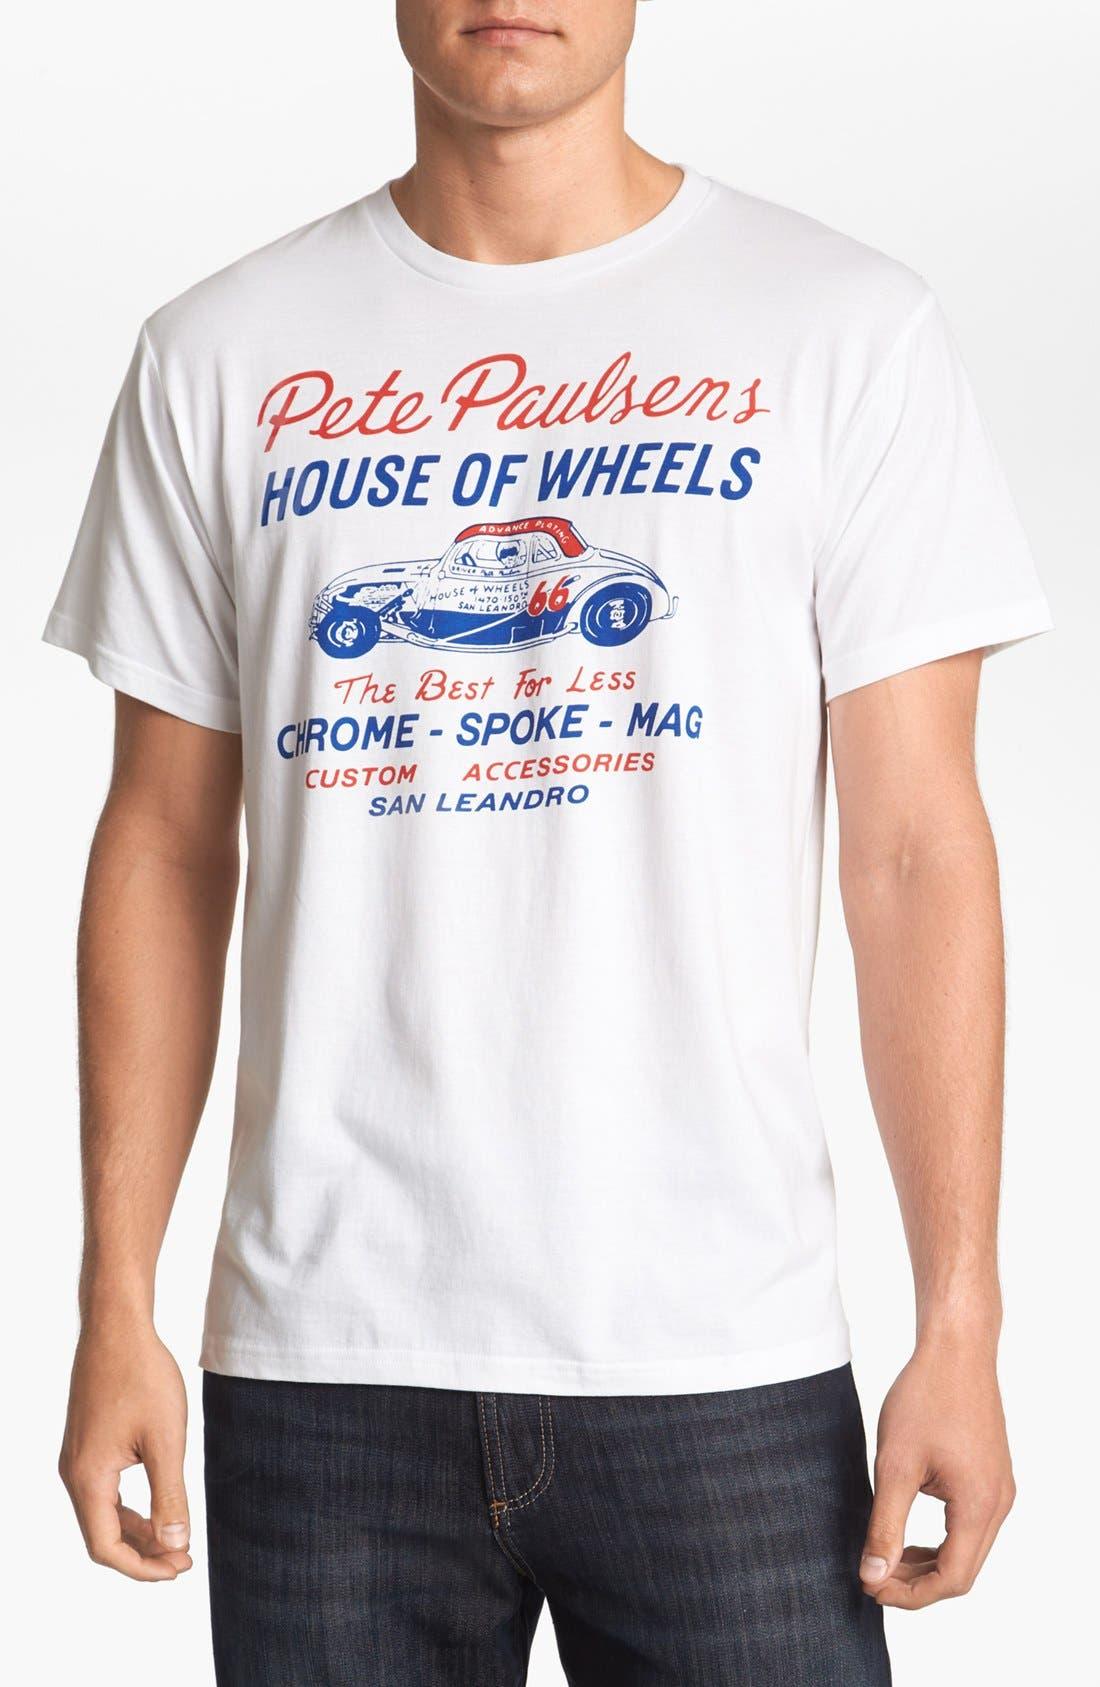 Main Image - Horses Cut Shop 'Peter Paulsen's House of Wheels' T-Shirt